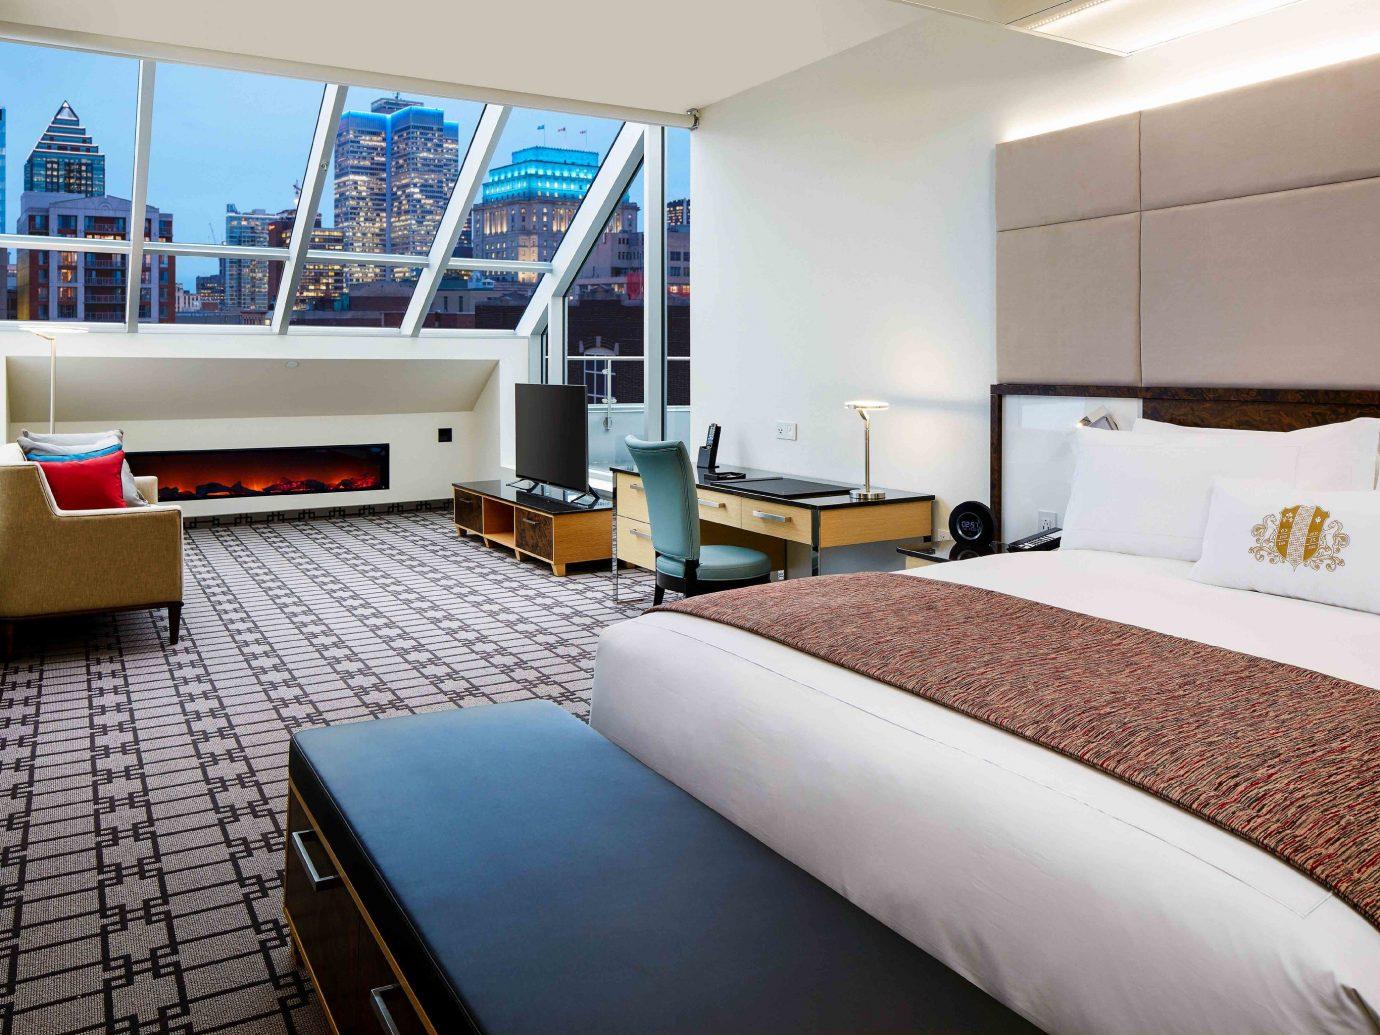 Canada Hotels Montreal Trip Ideas indoor wall bed floor room ceiling window Suite Bedroom real estate interior design hotel containing